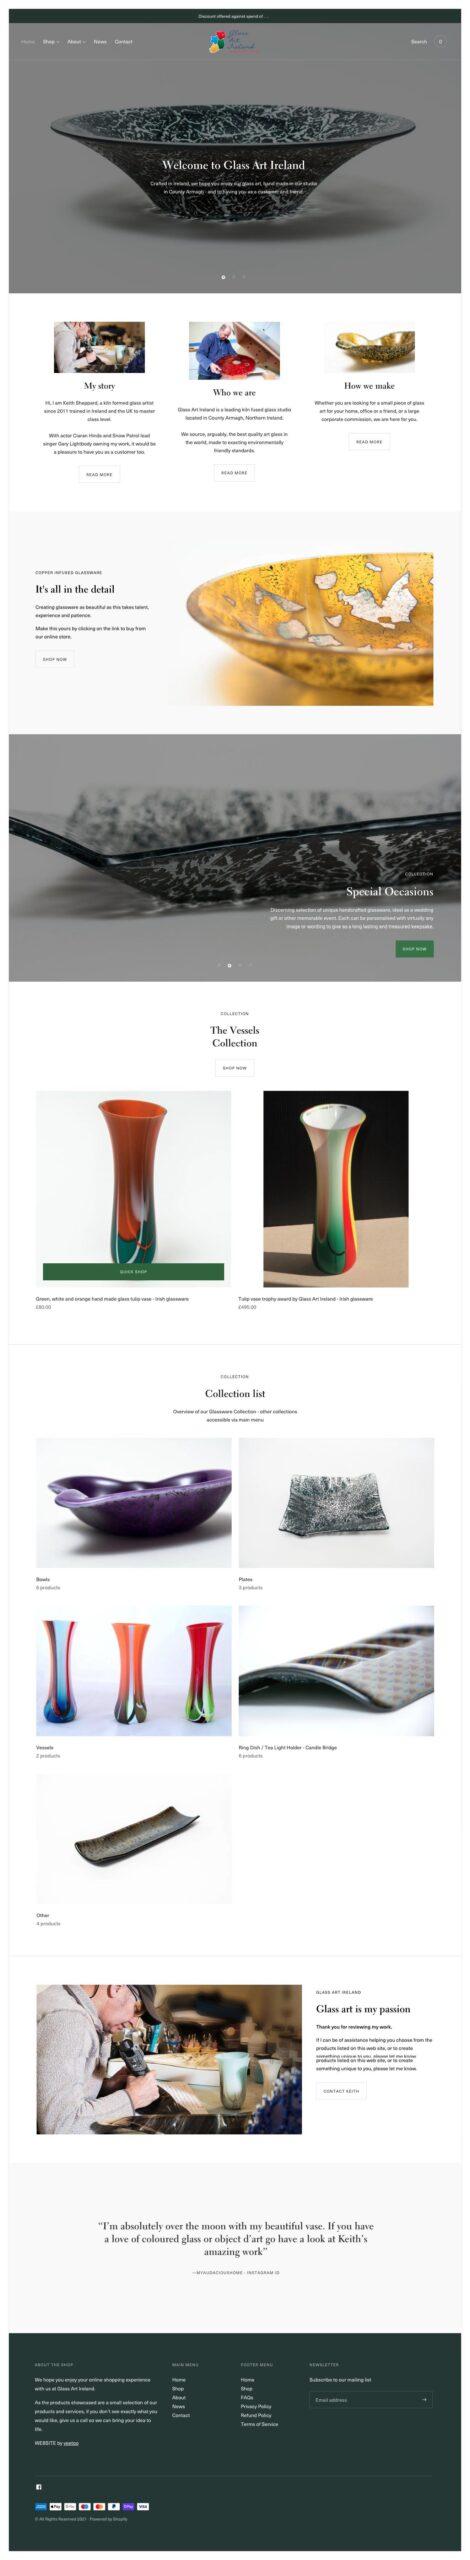 Website design portfolio project 11 - website home page for Keith Sheppard Glass designed by veetoo website design and development, Belfast, Northern Ireland